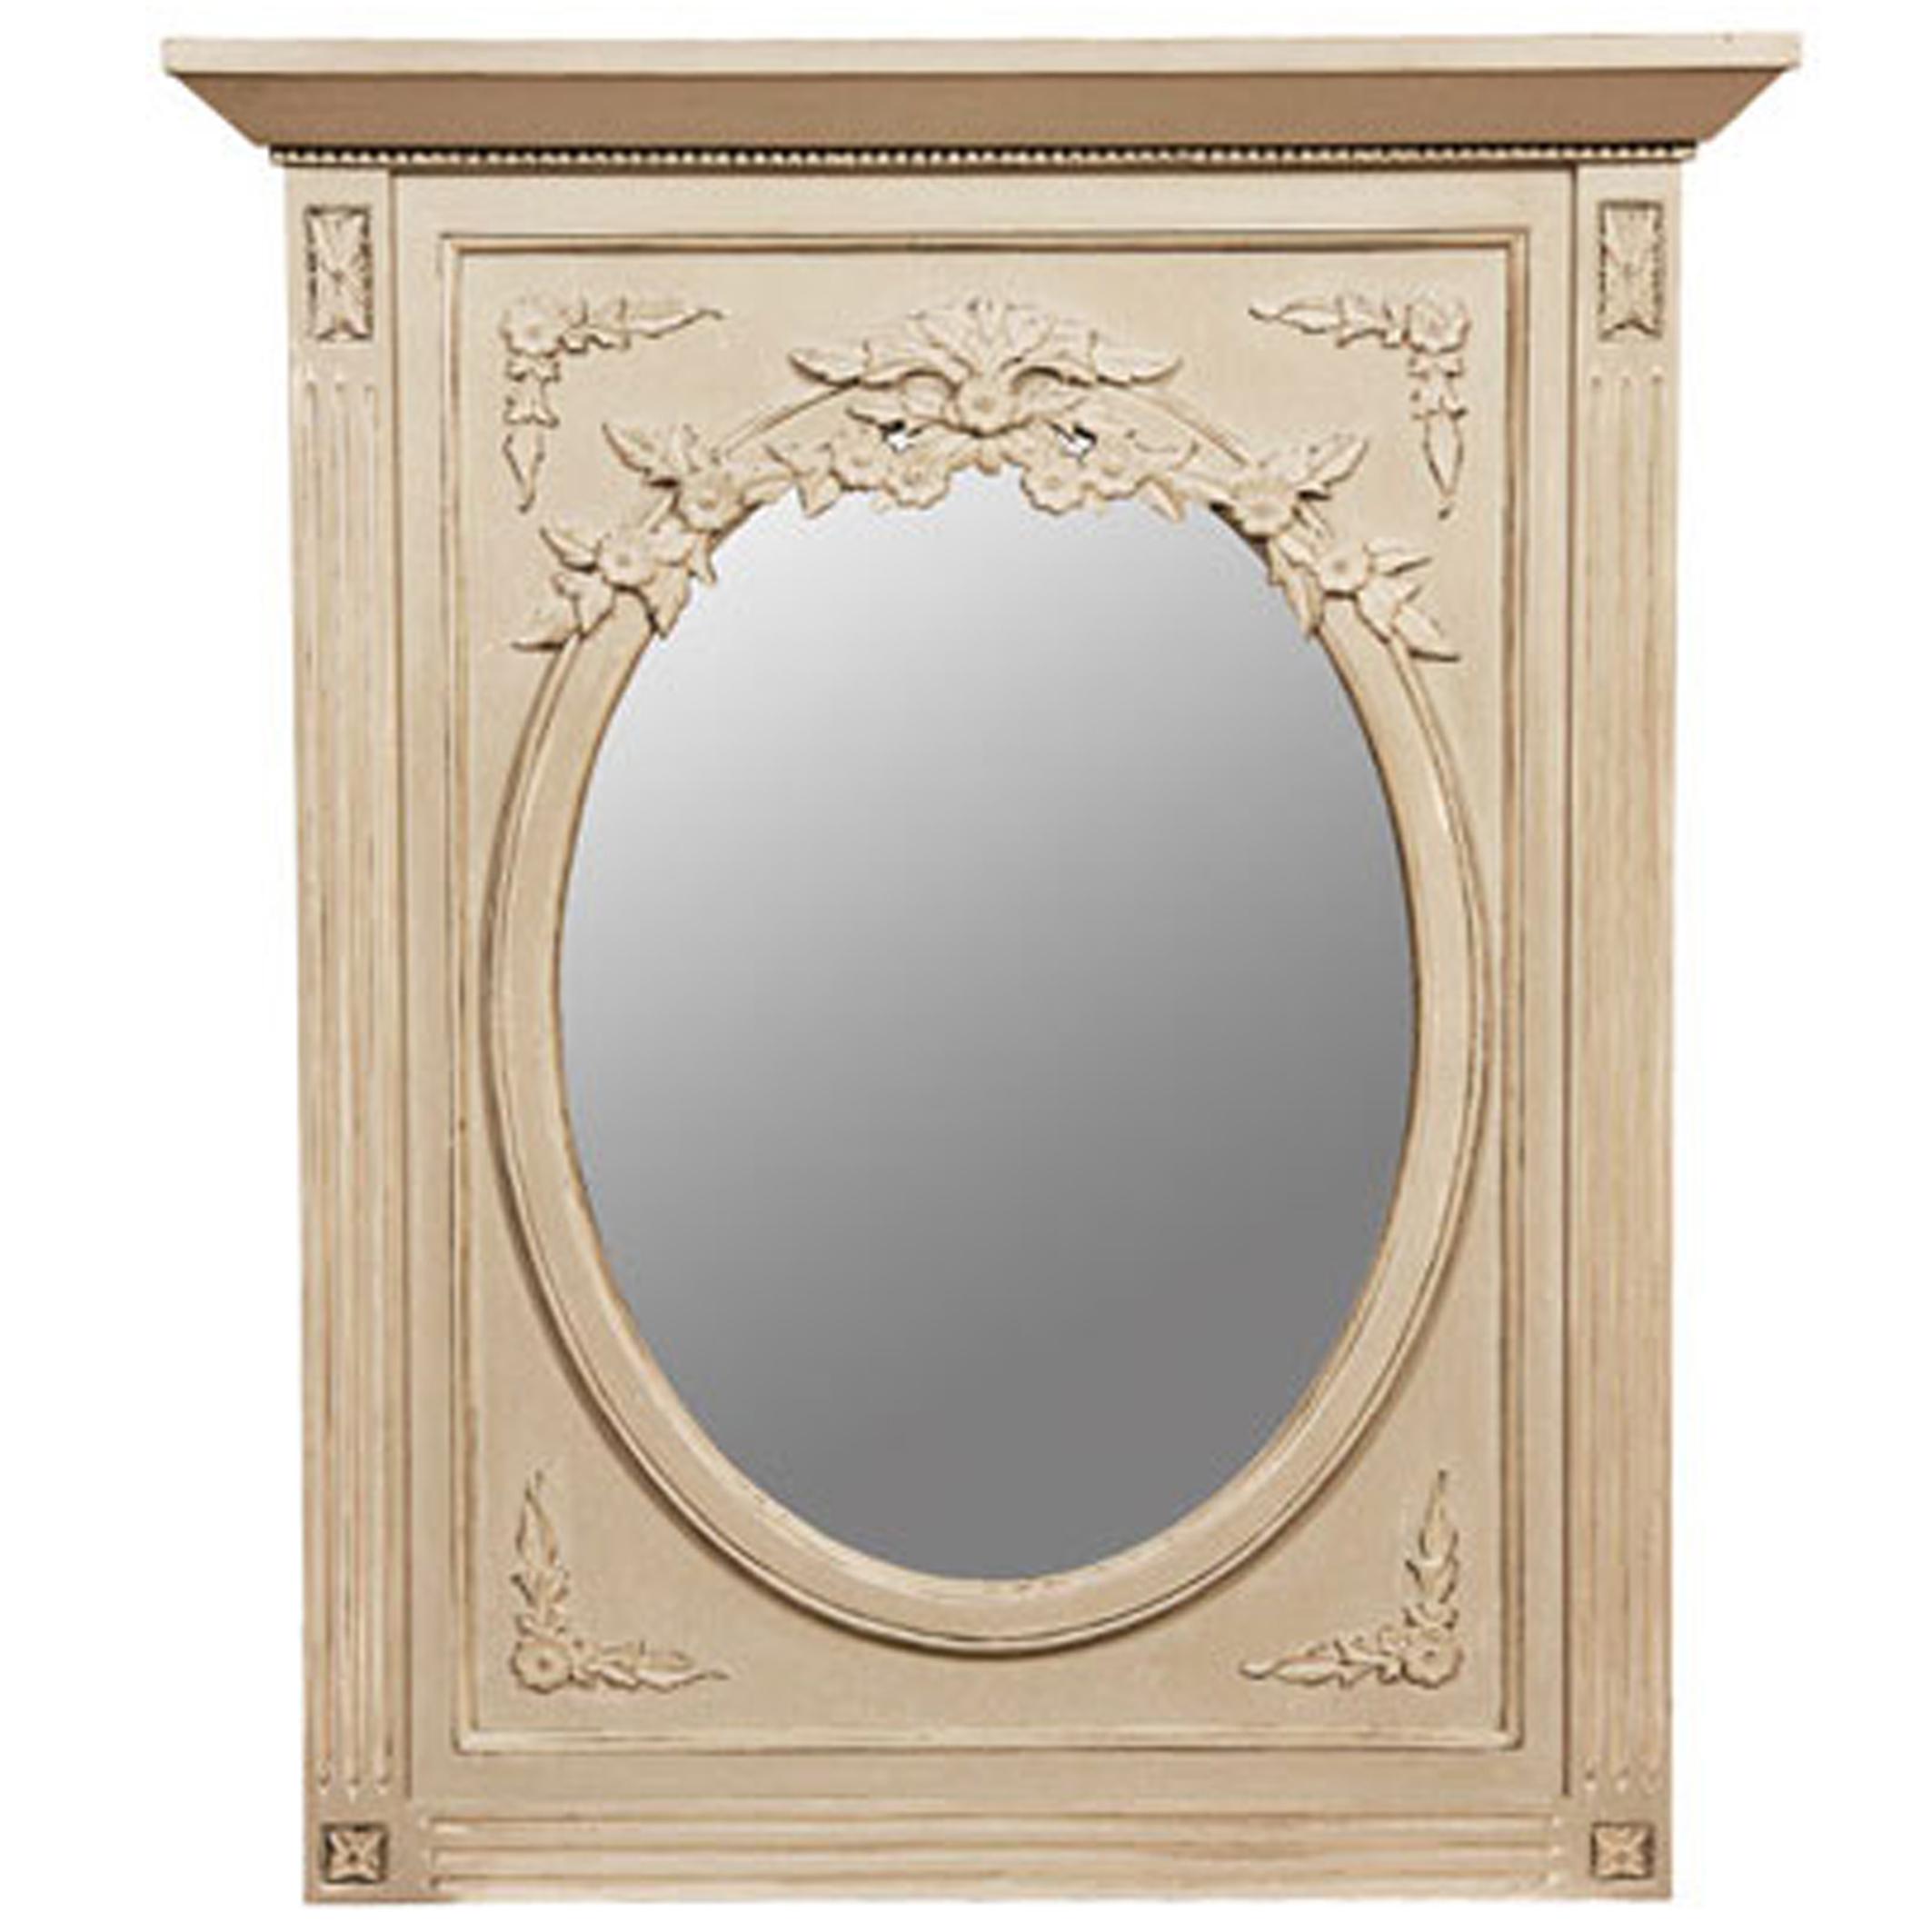 Miroir trumeau gustavien blanc cass vieilli laqu for Miroir blanc vieilli